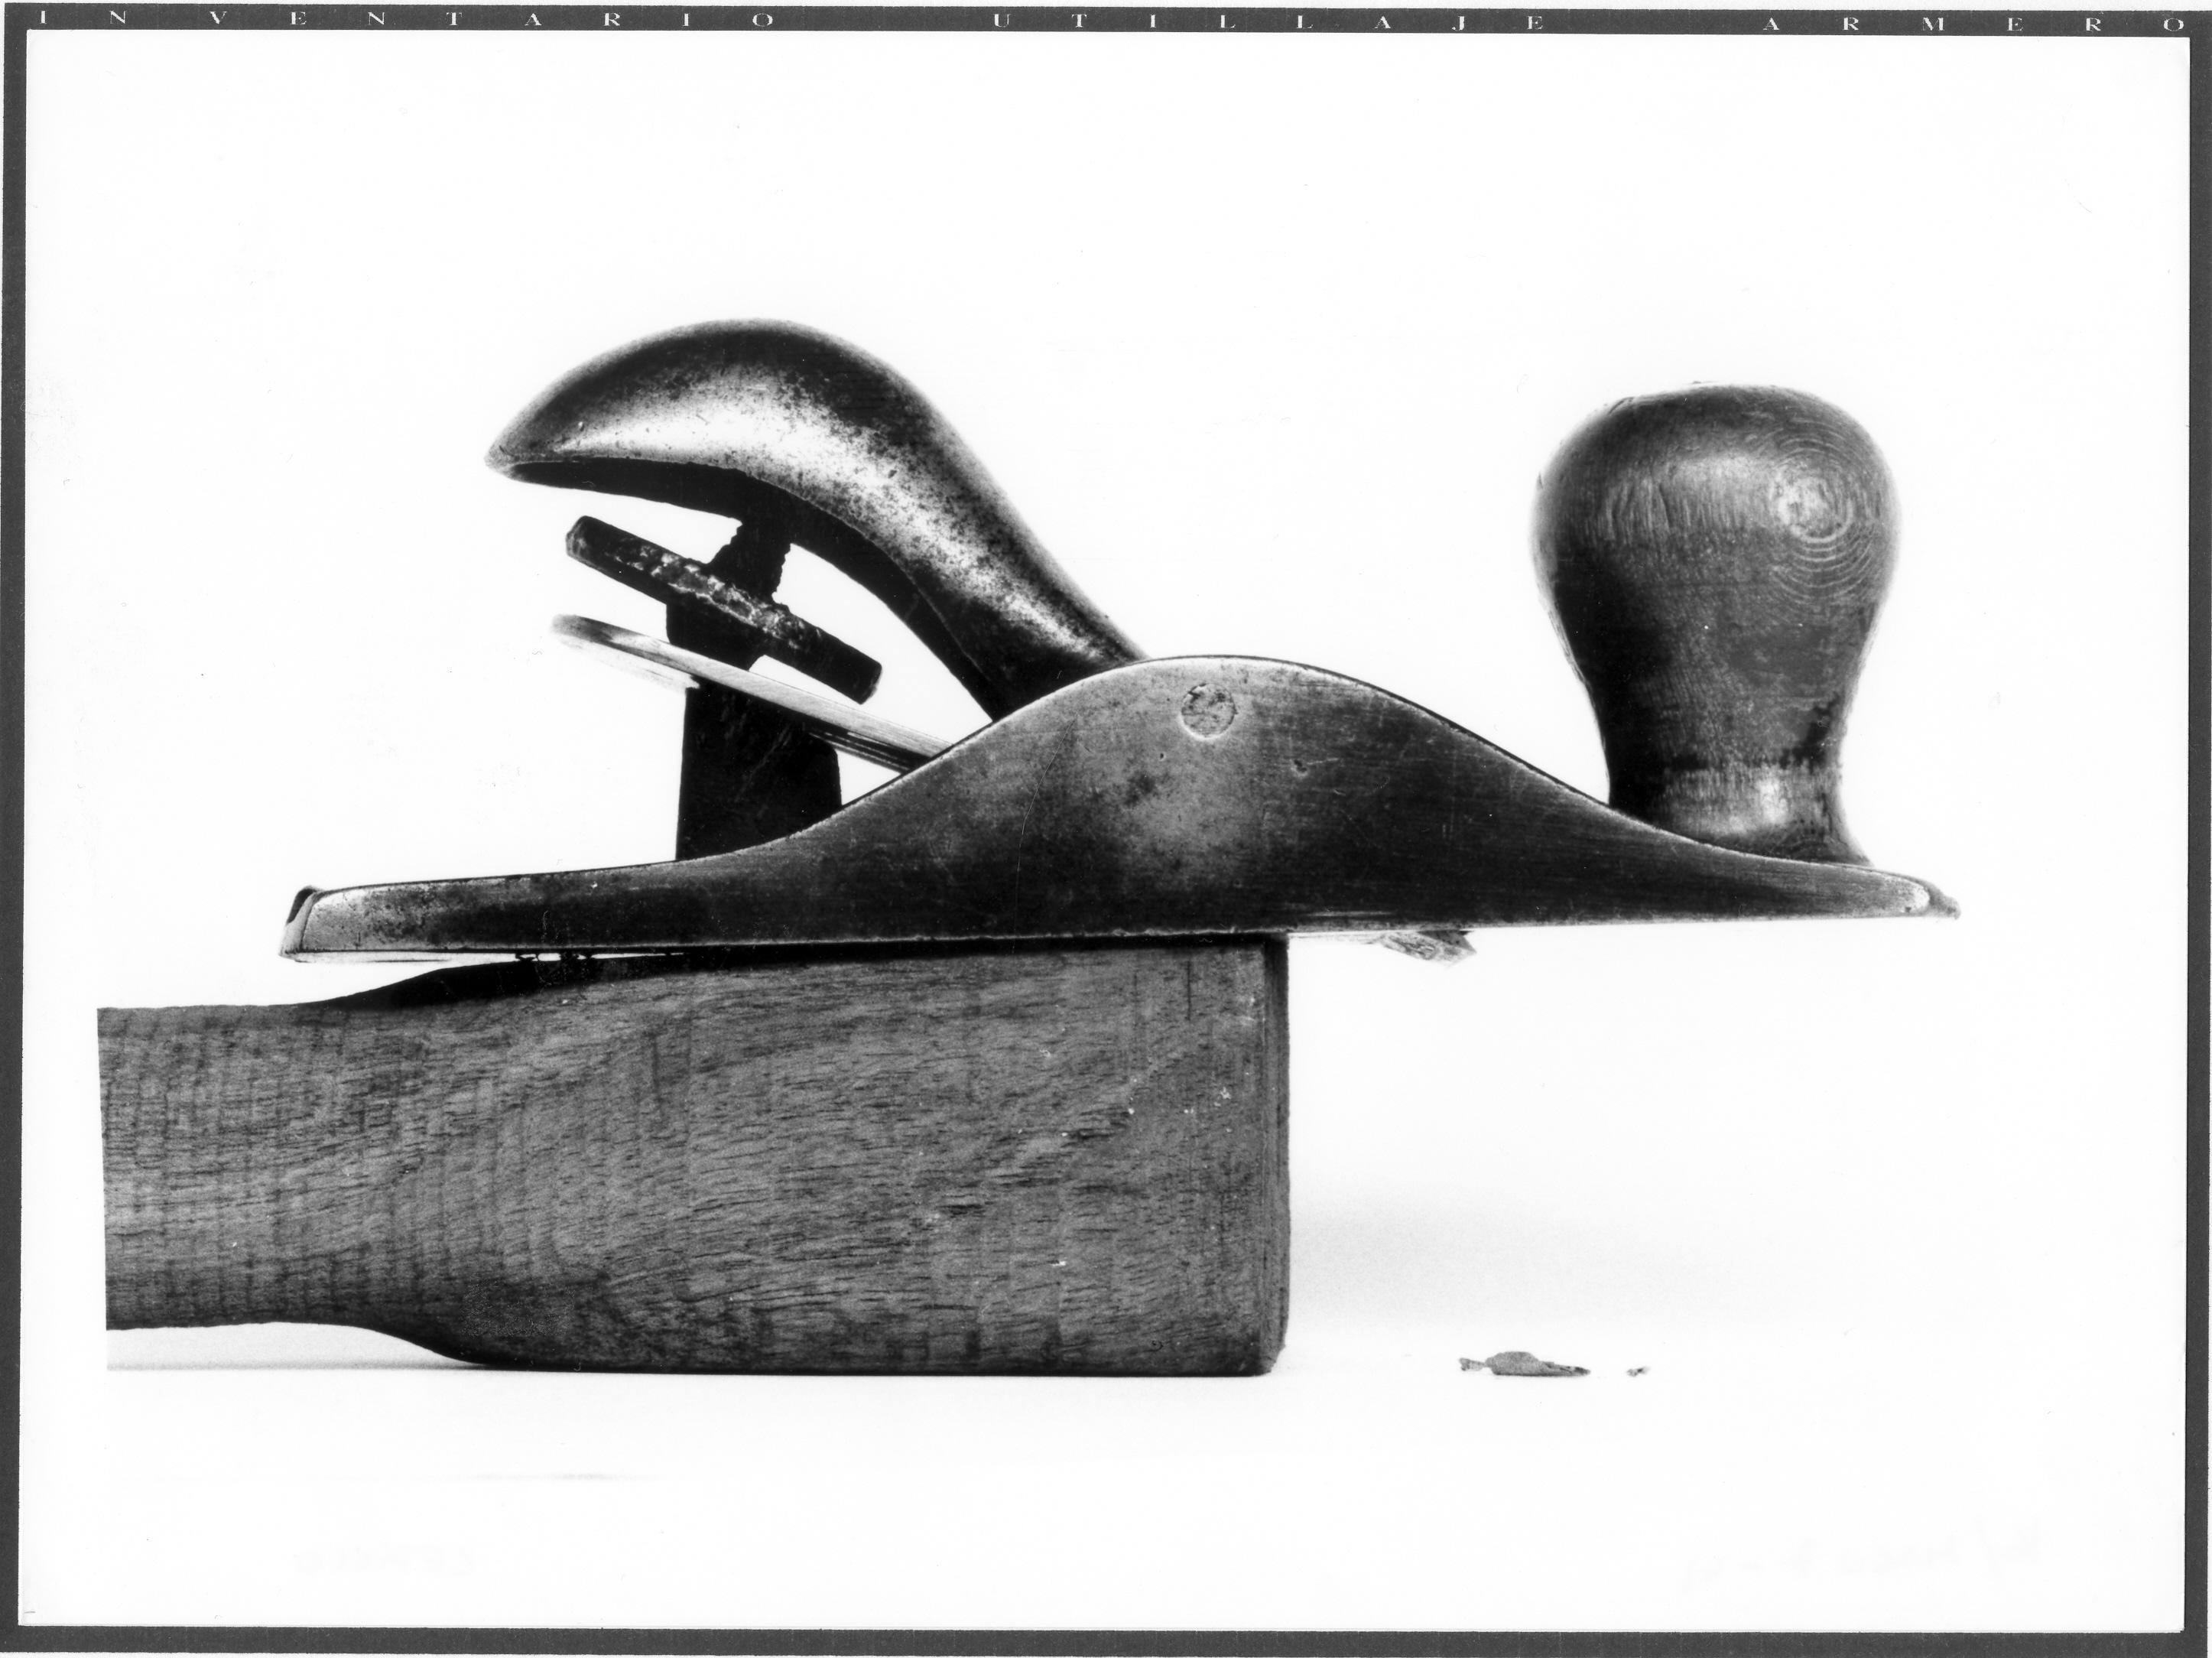 Cepillo de carpintero